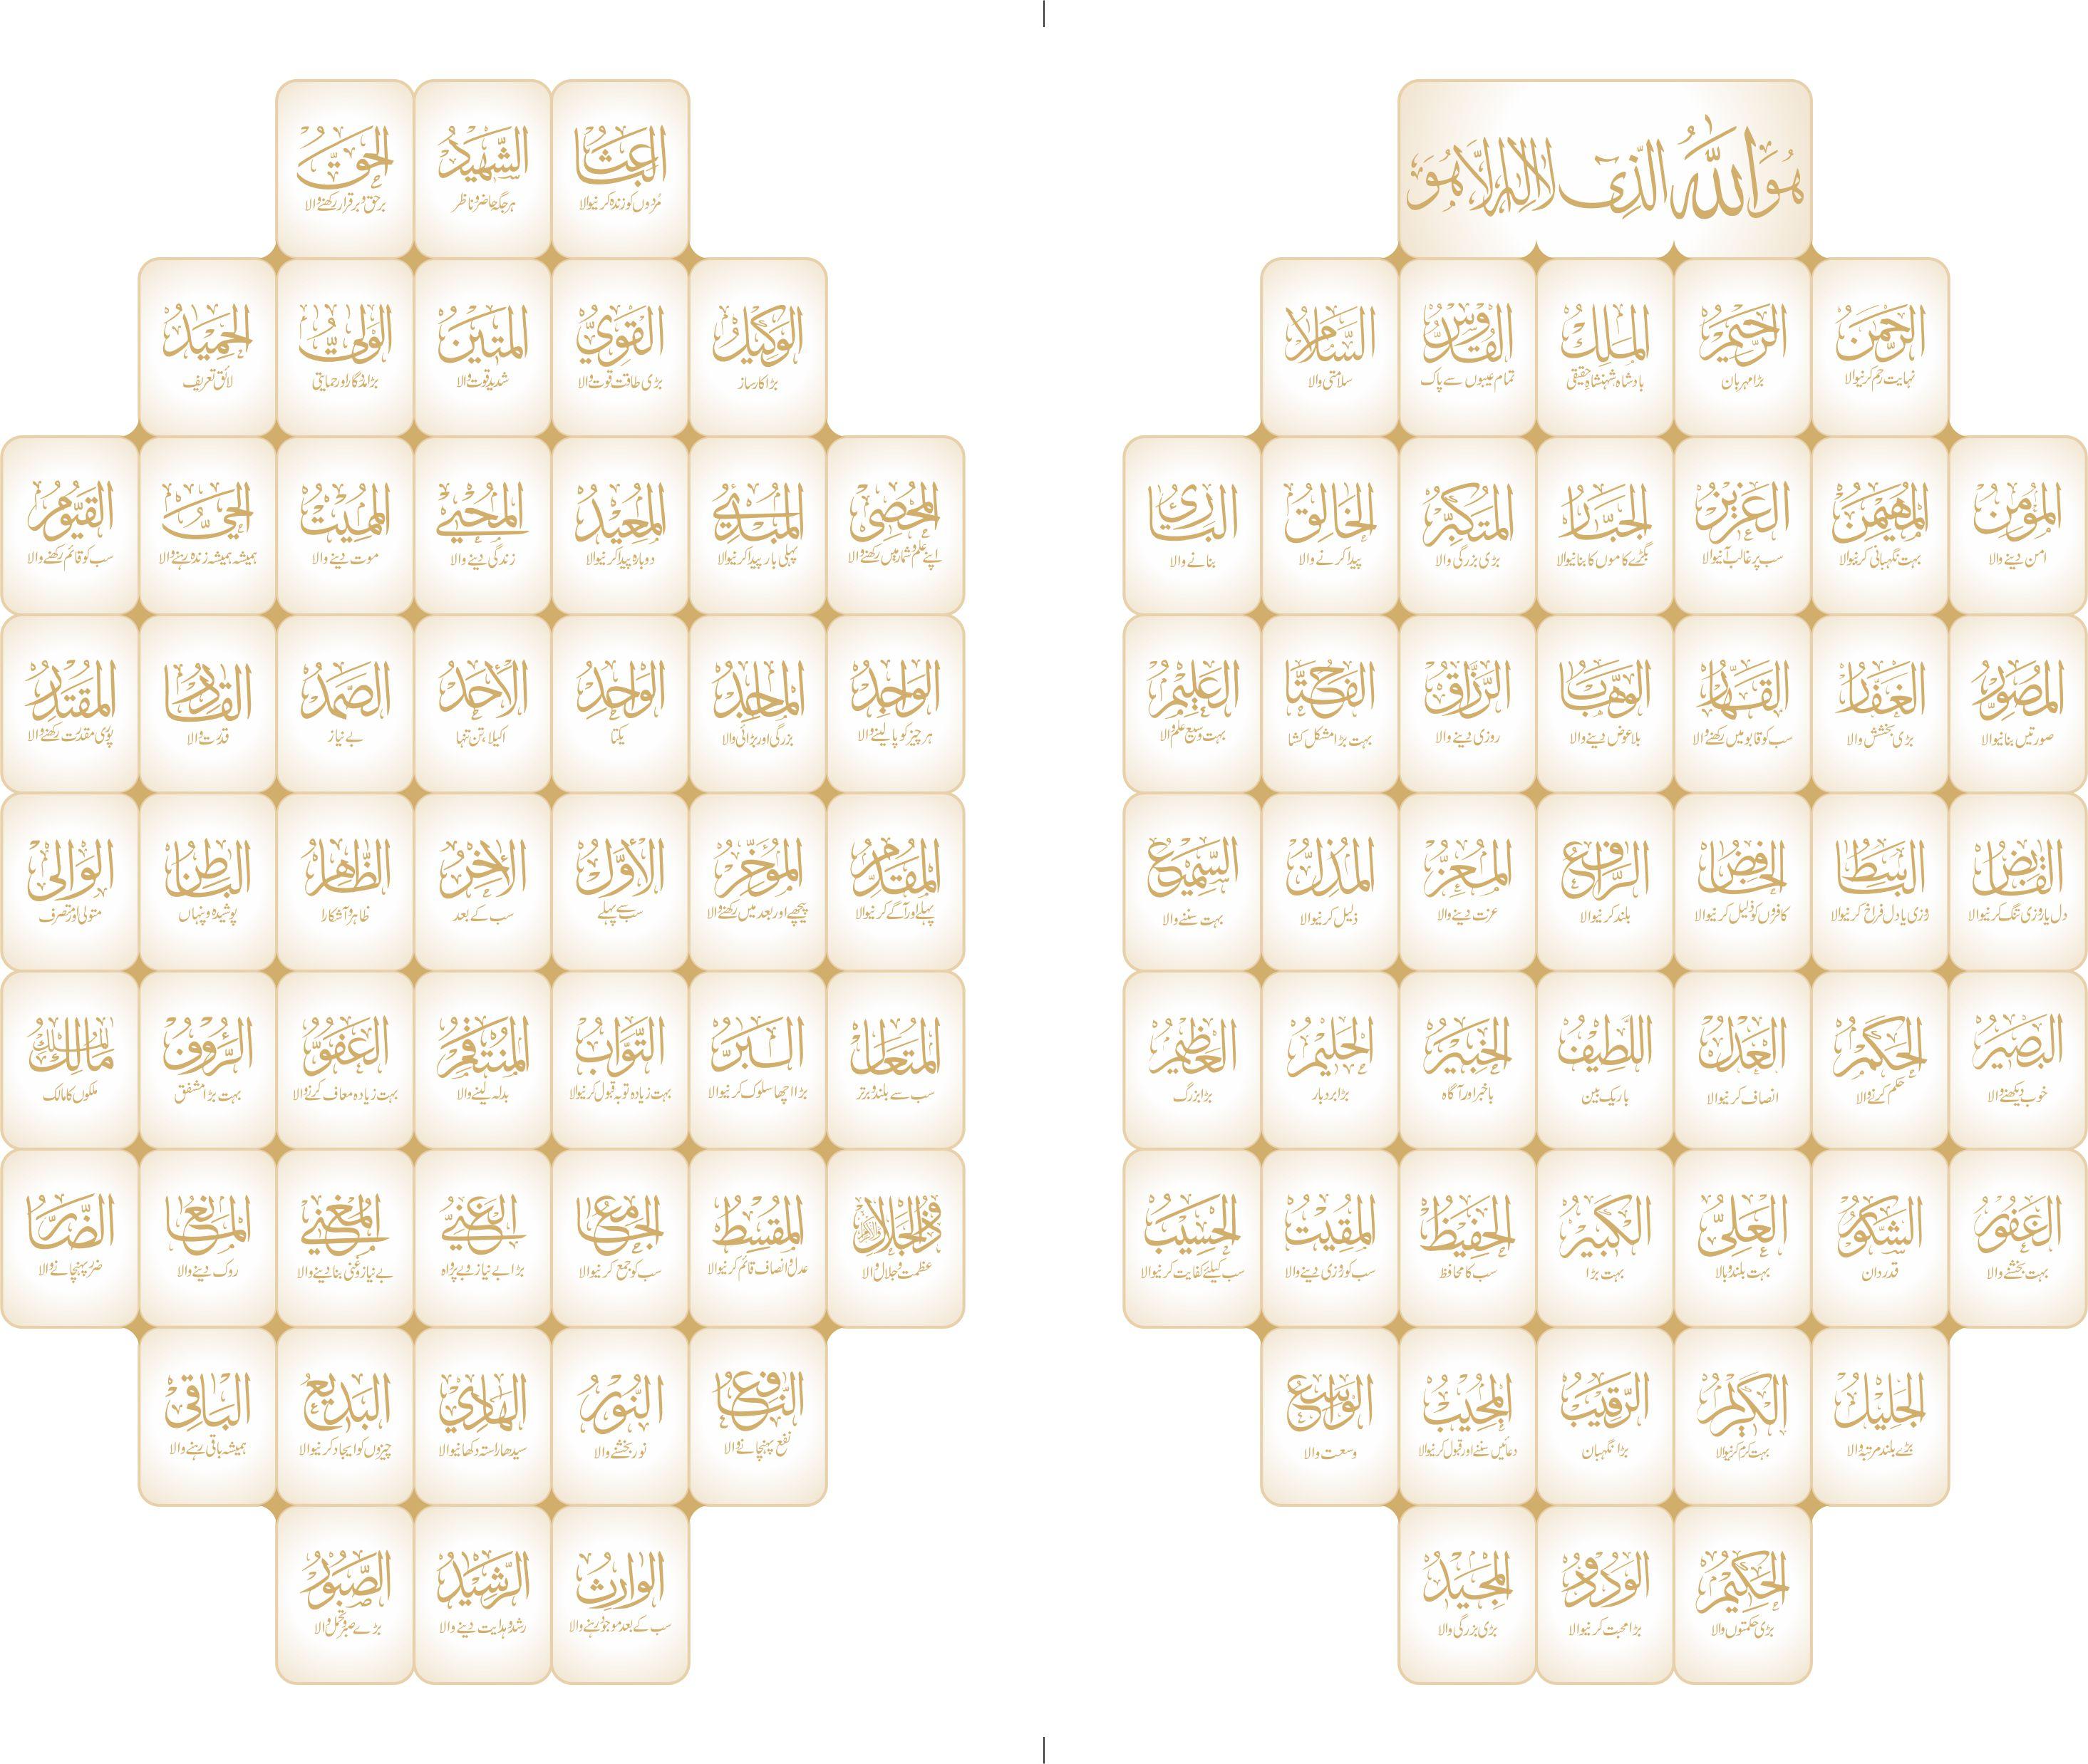 Great Wallpaper Name Arabic - 99_names_of_allah_by_zeeshan83-d3h38jb  Snapshot_562787.jpg